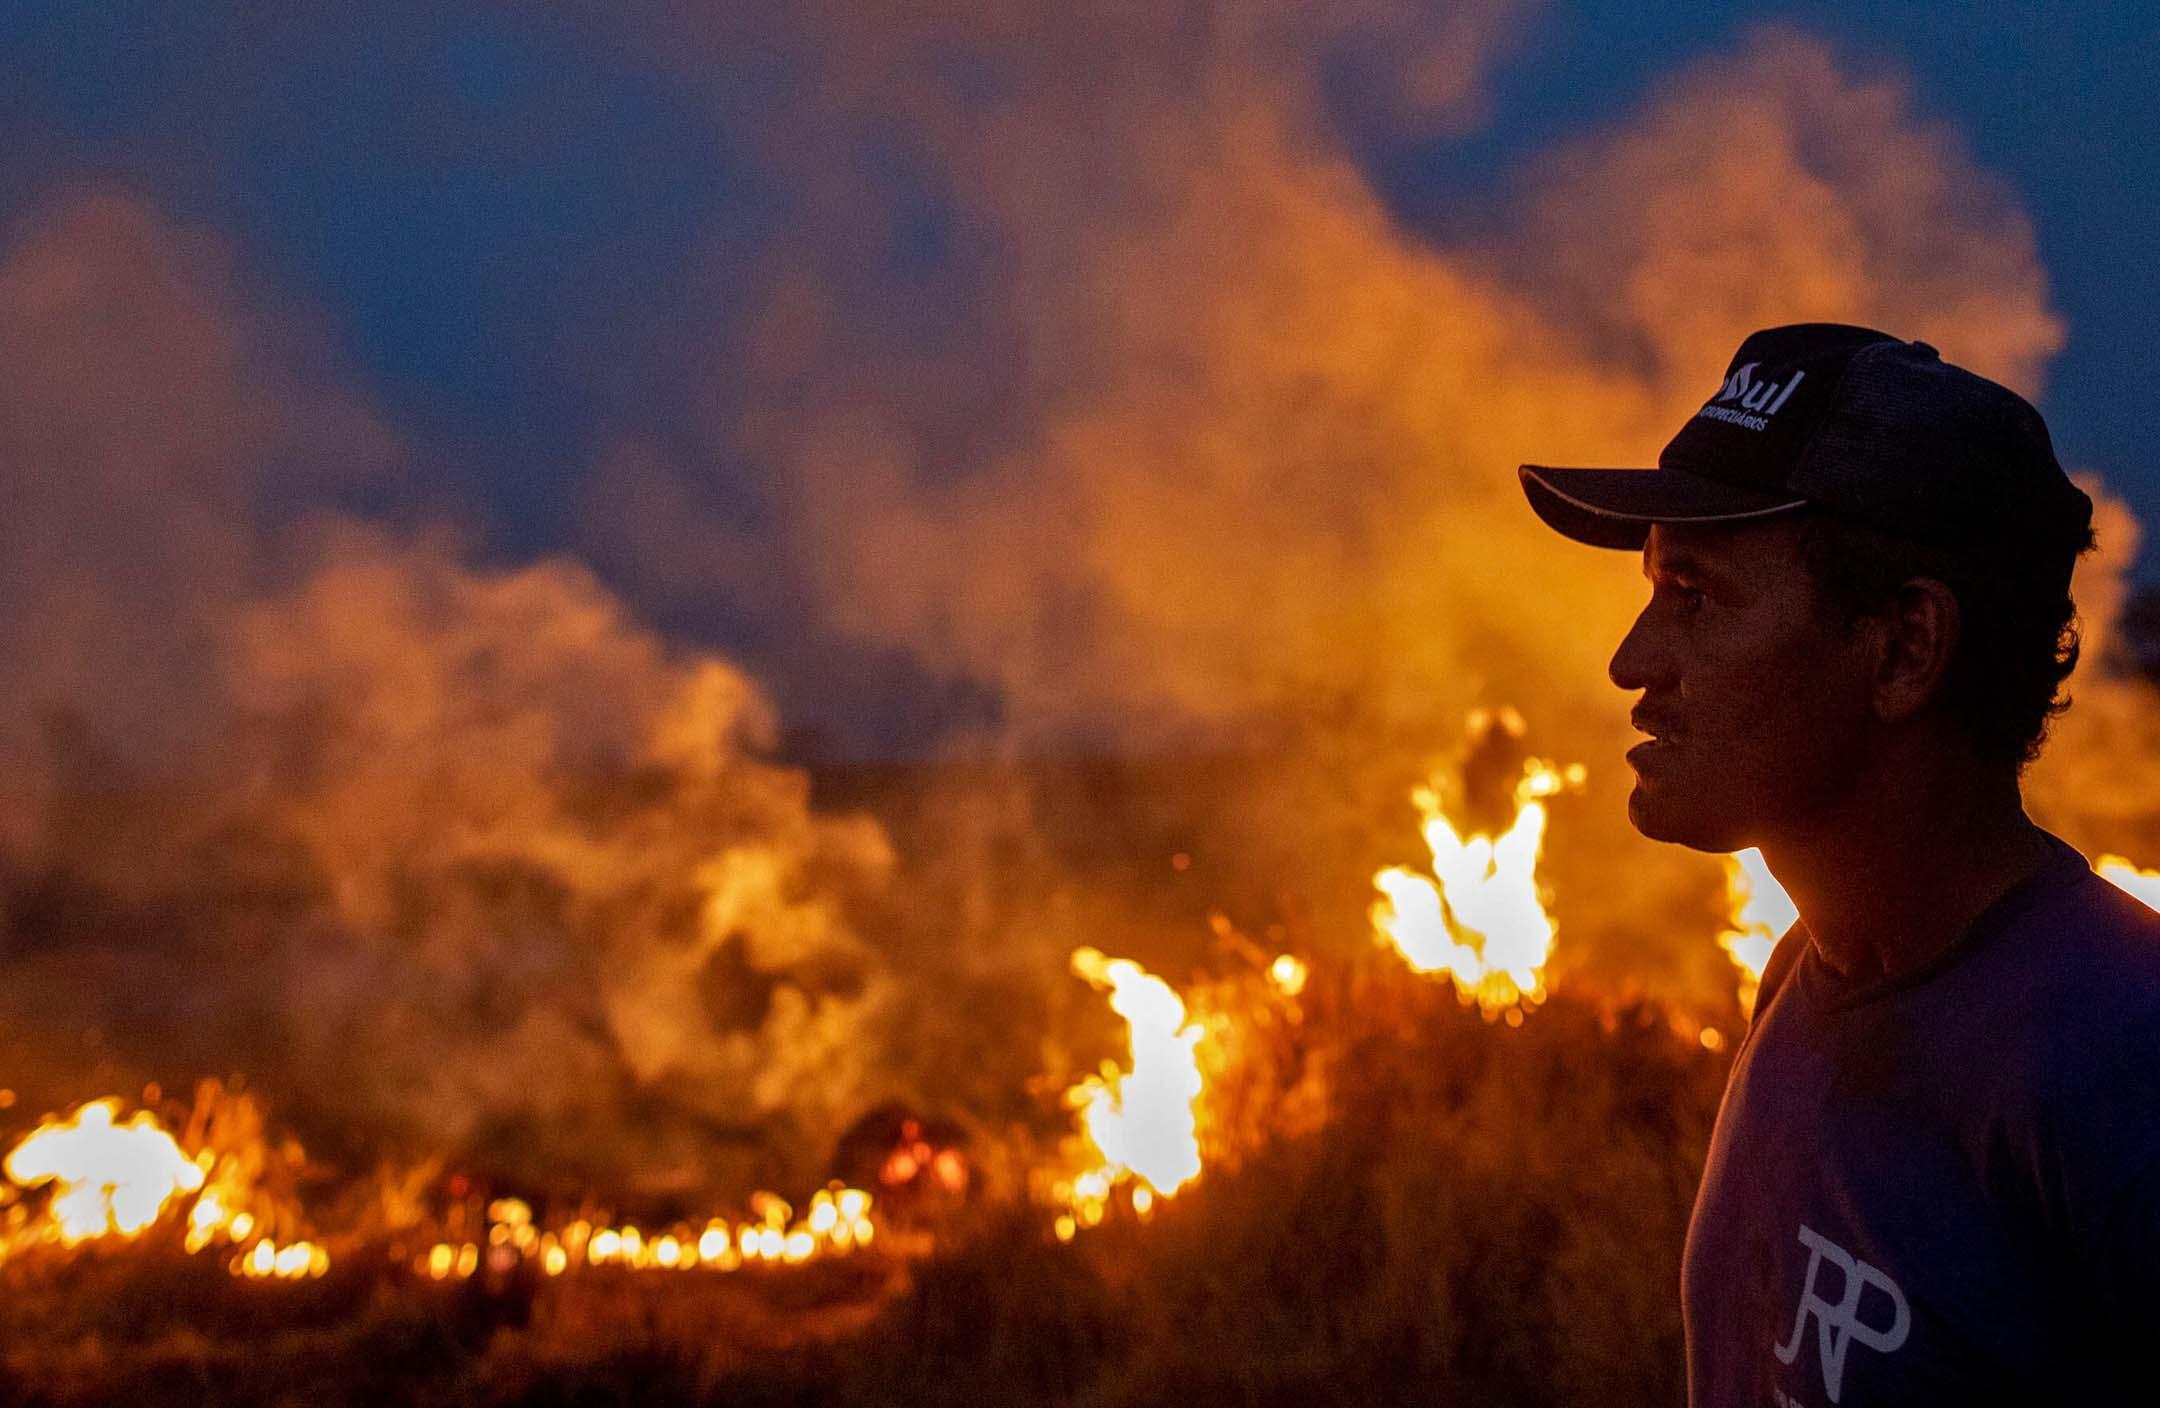 2019年8月23日,亞馬遜火災蔓延至巴西北部Mato Grosso的一個農場。 攝:Joao Laet/AFP/Getty Images